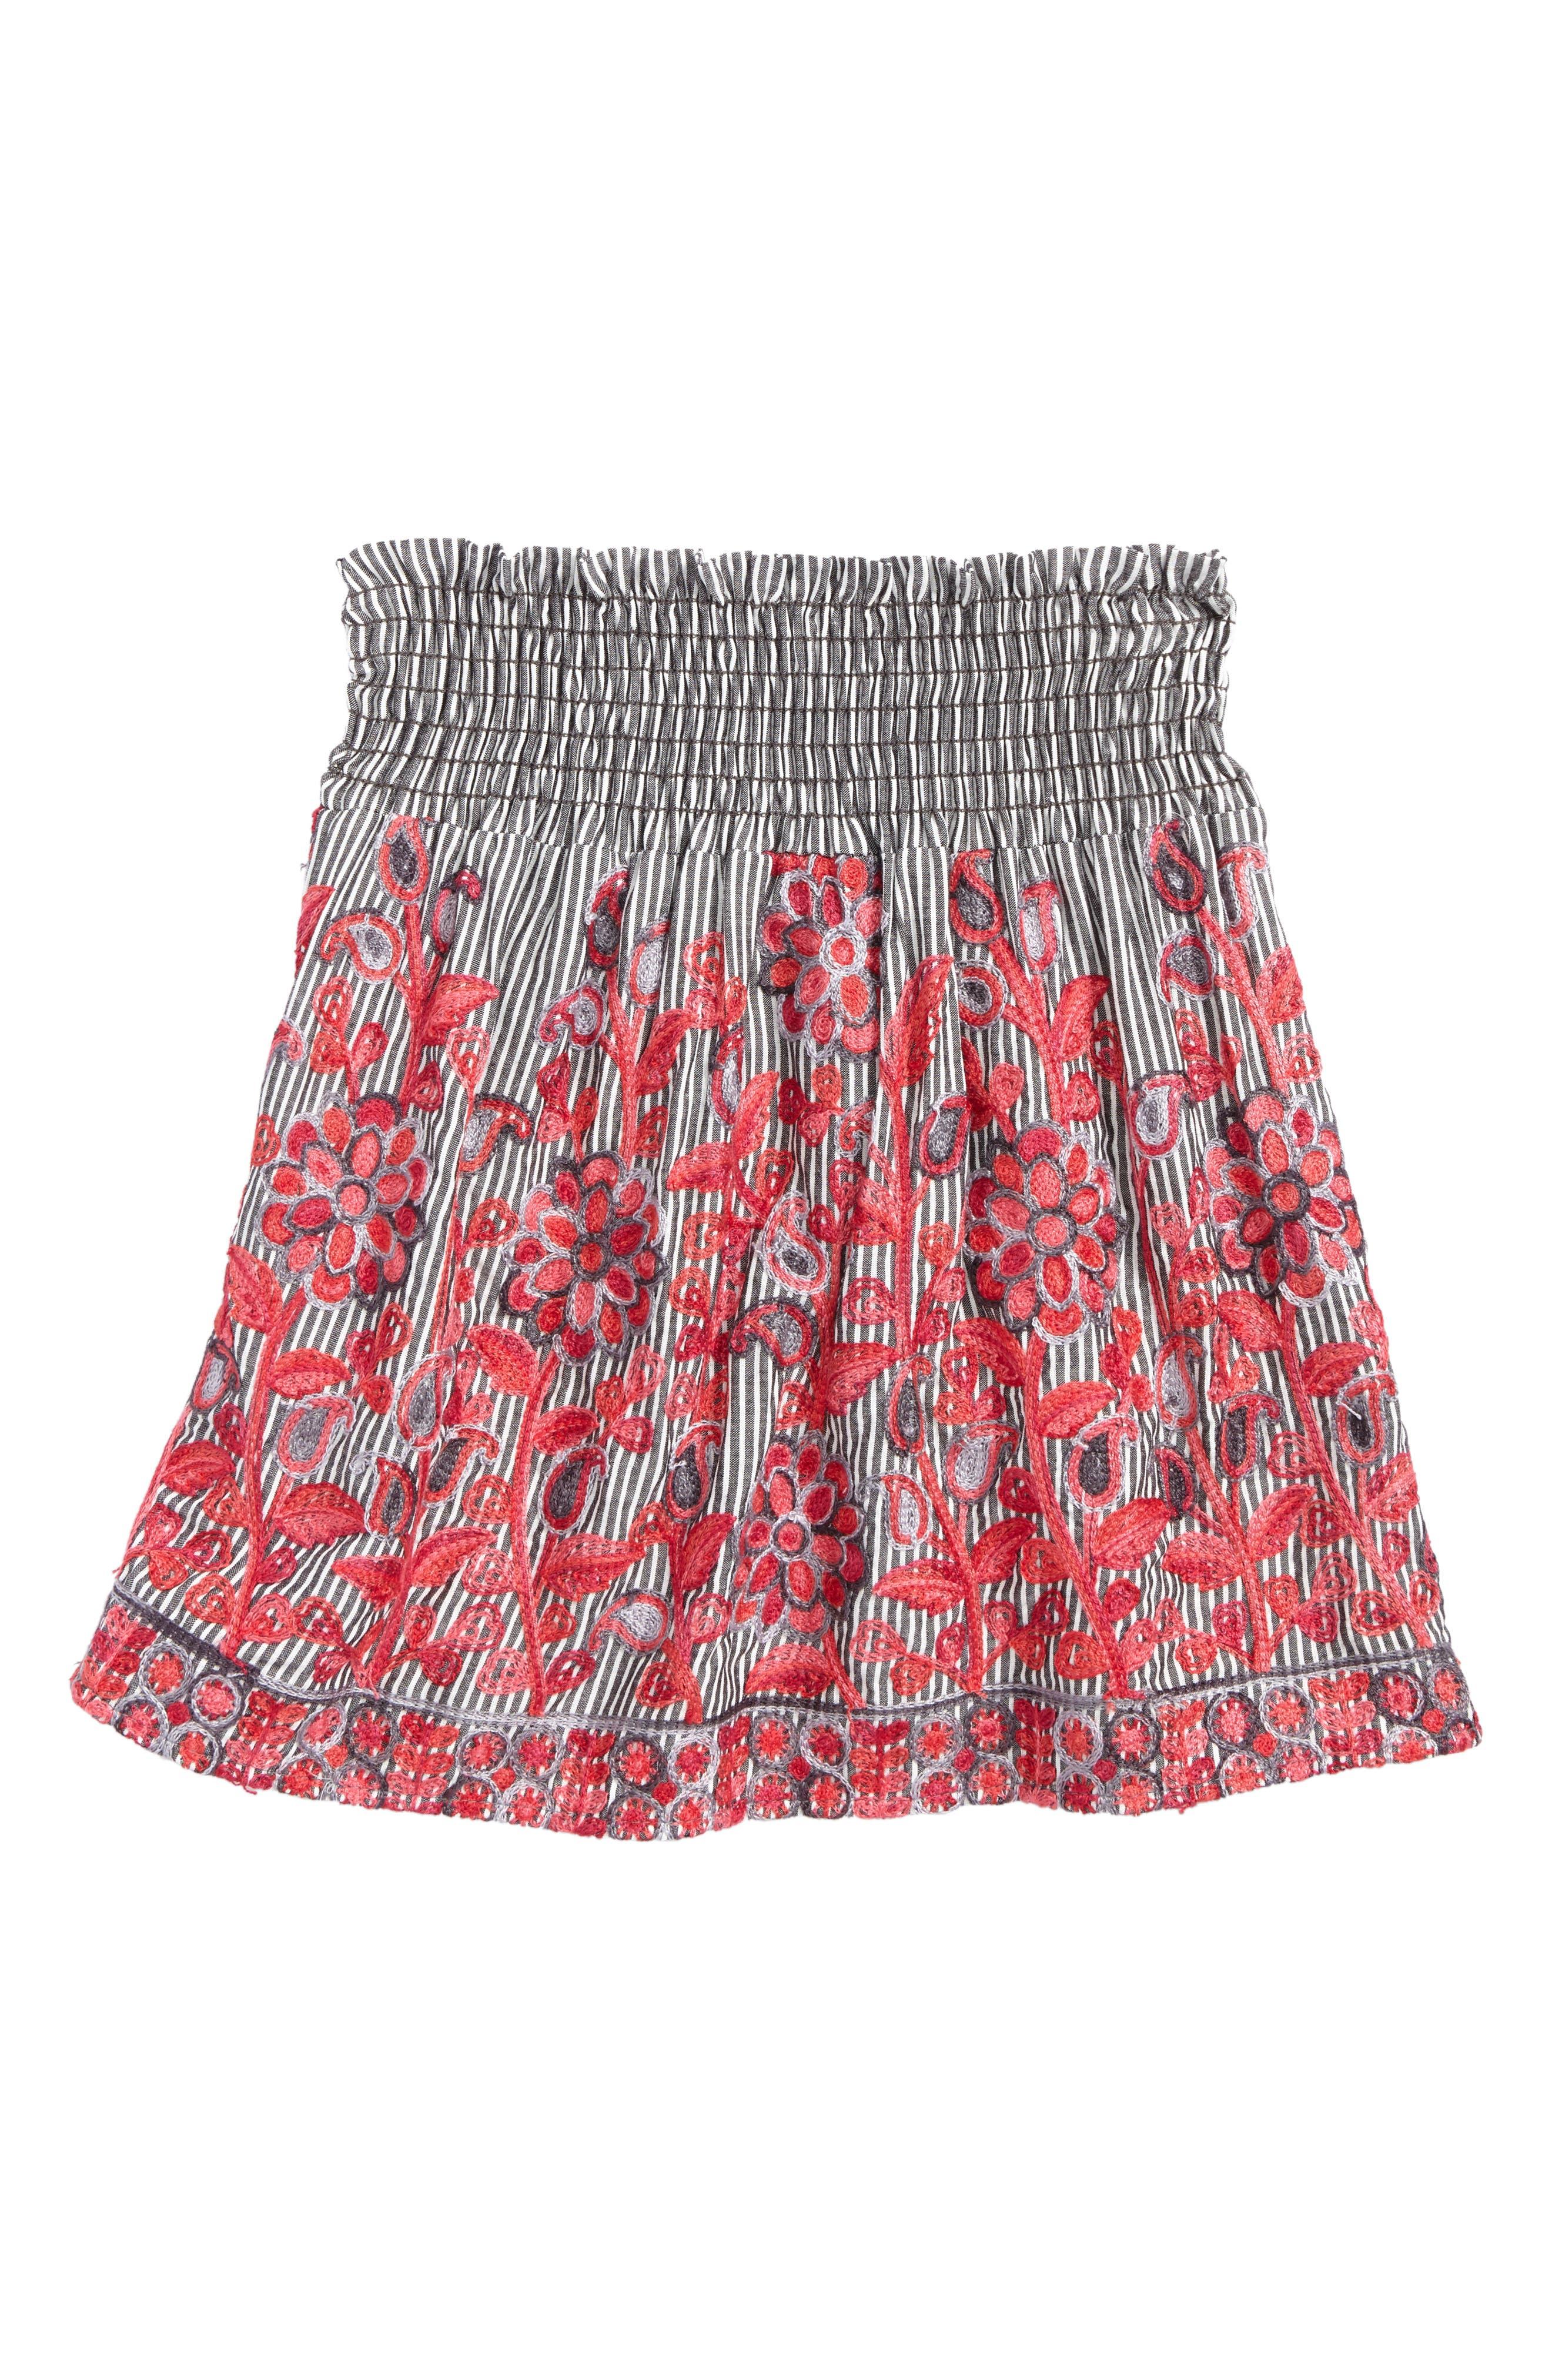 Kiddo Flower Embroidered Skirt (Big Girls)